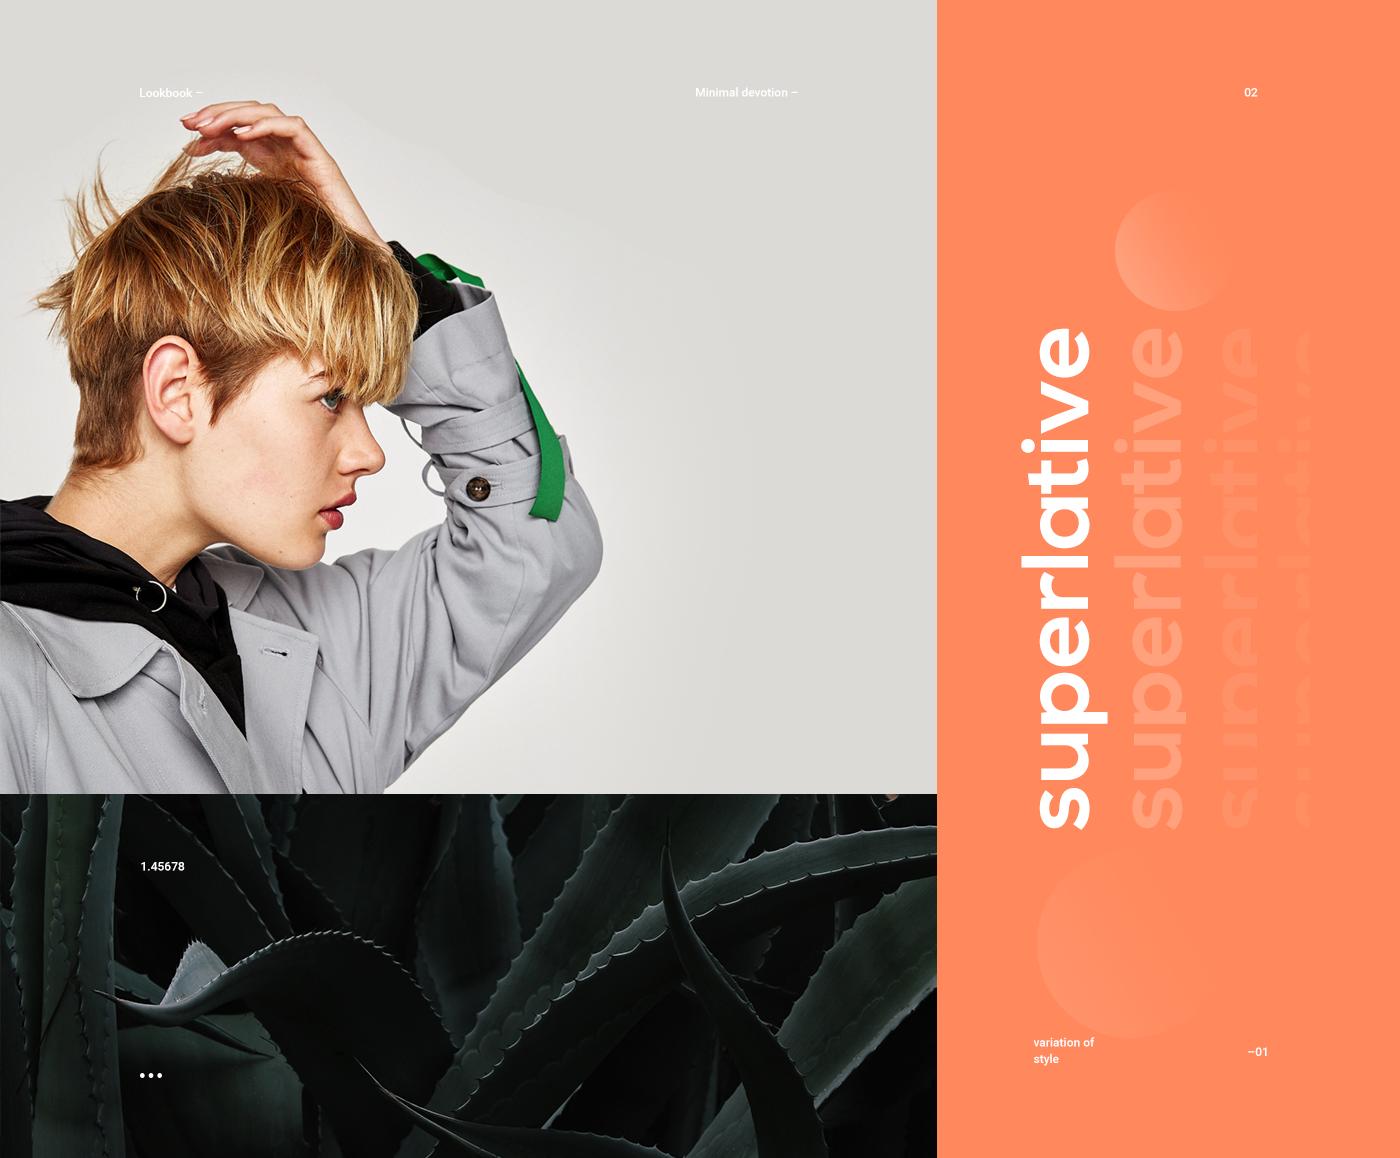 Playful Web Design & UI/UX for Superlative Store Concept